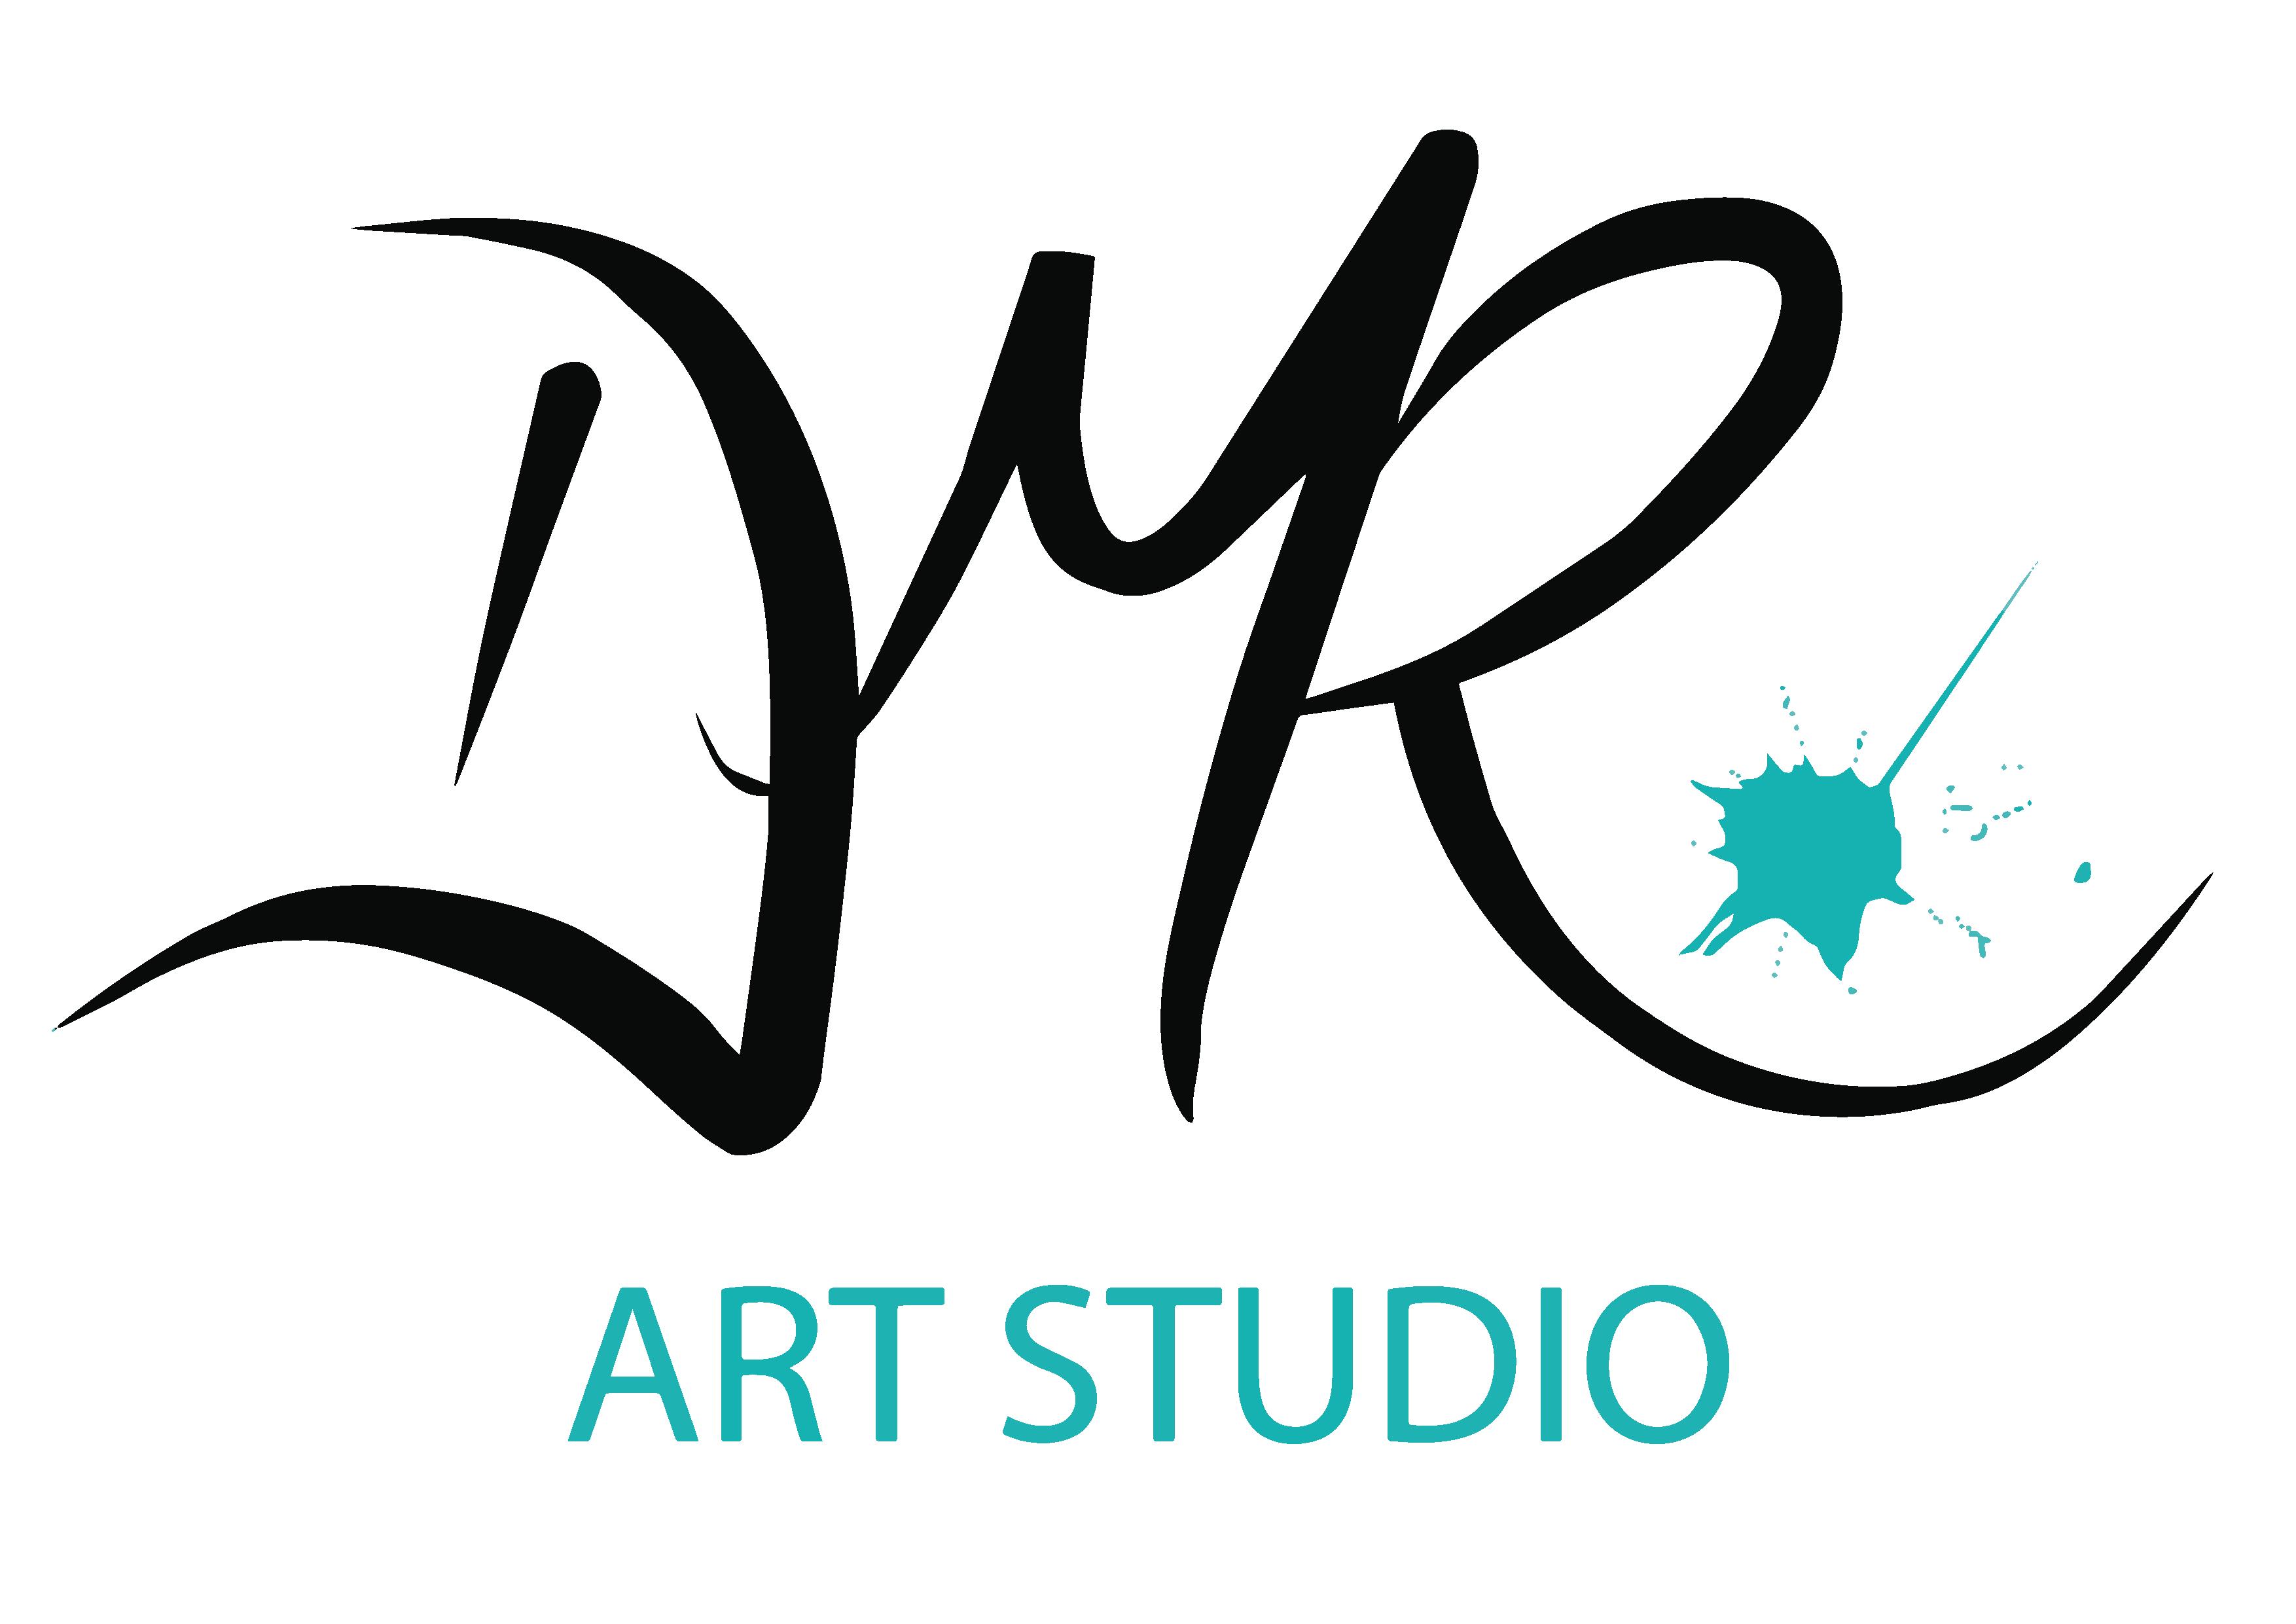 DMR Art Studio